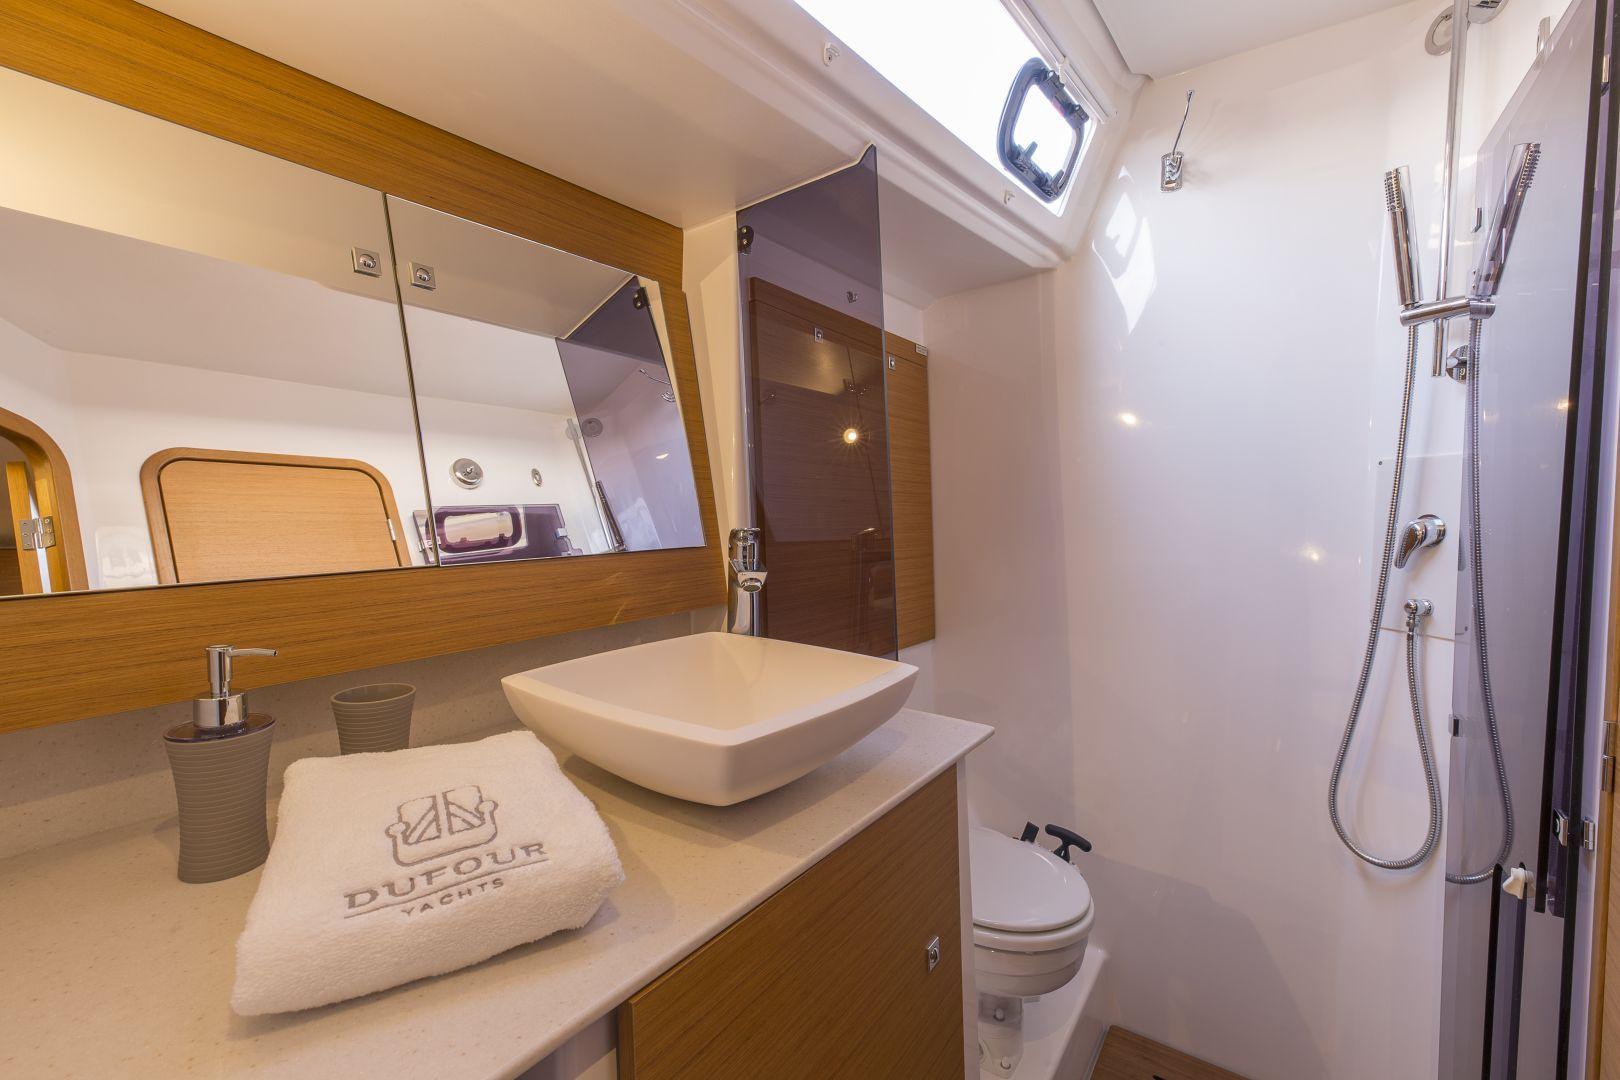 Dufour 520 Bathroom